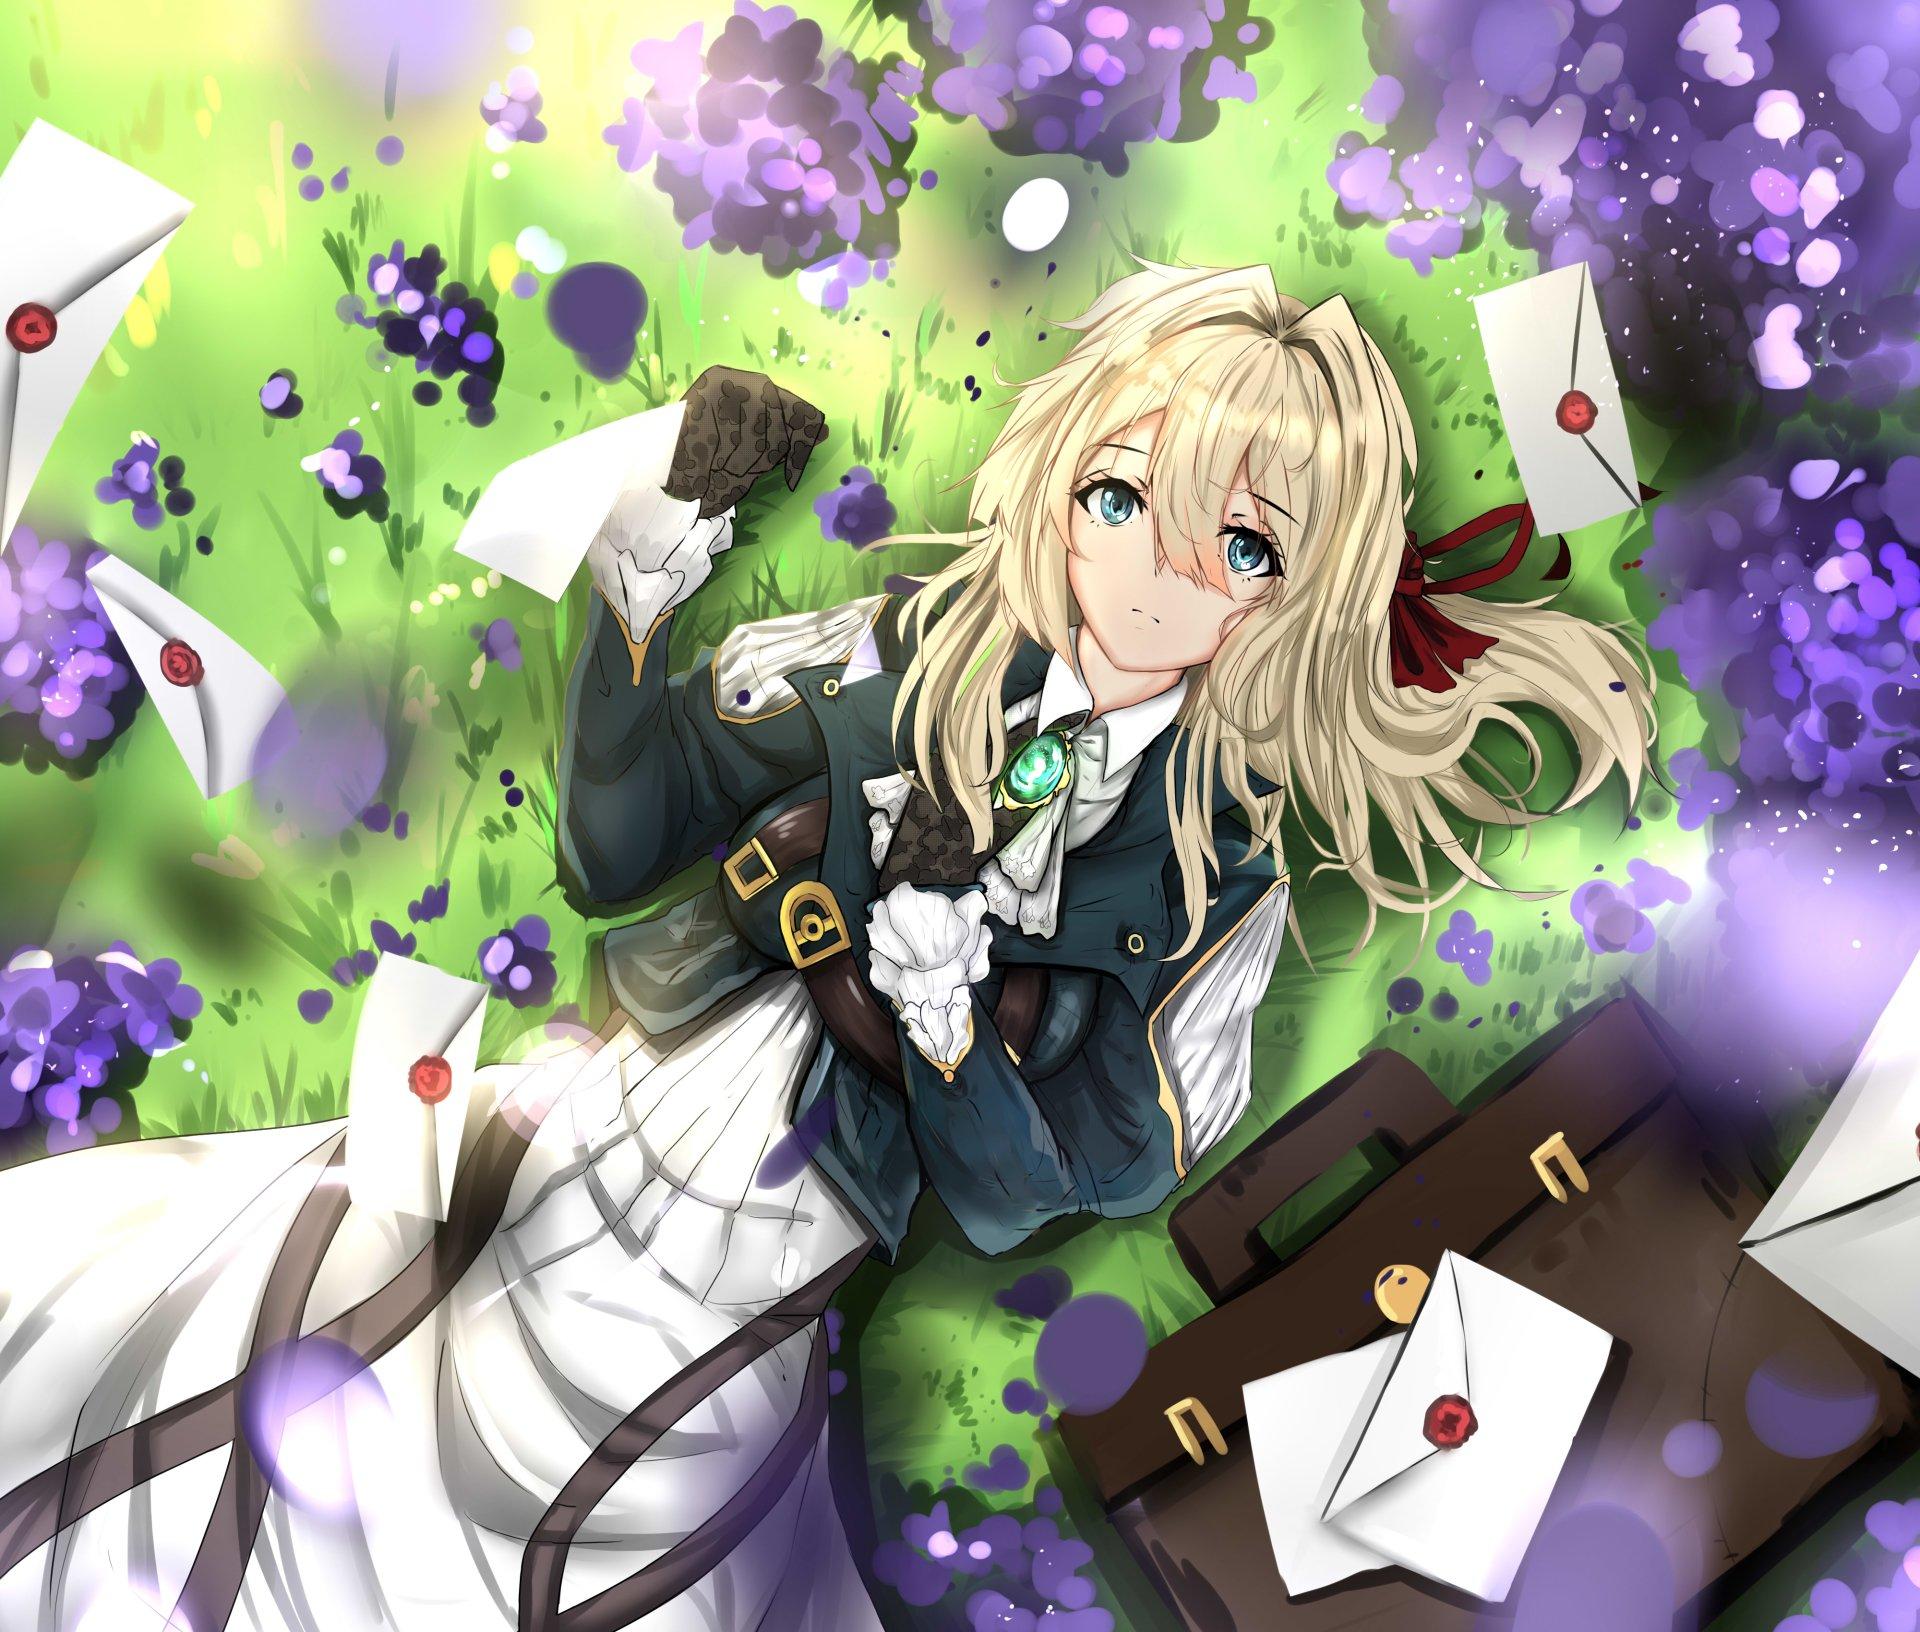 动漫 - 紫罗兰永恒花园  Violet Evergarden (Character) 壁纸